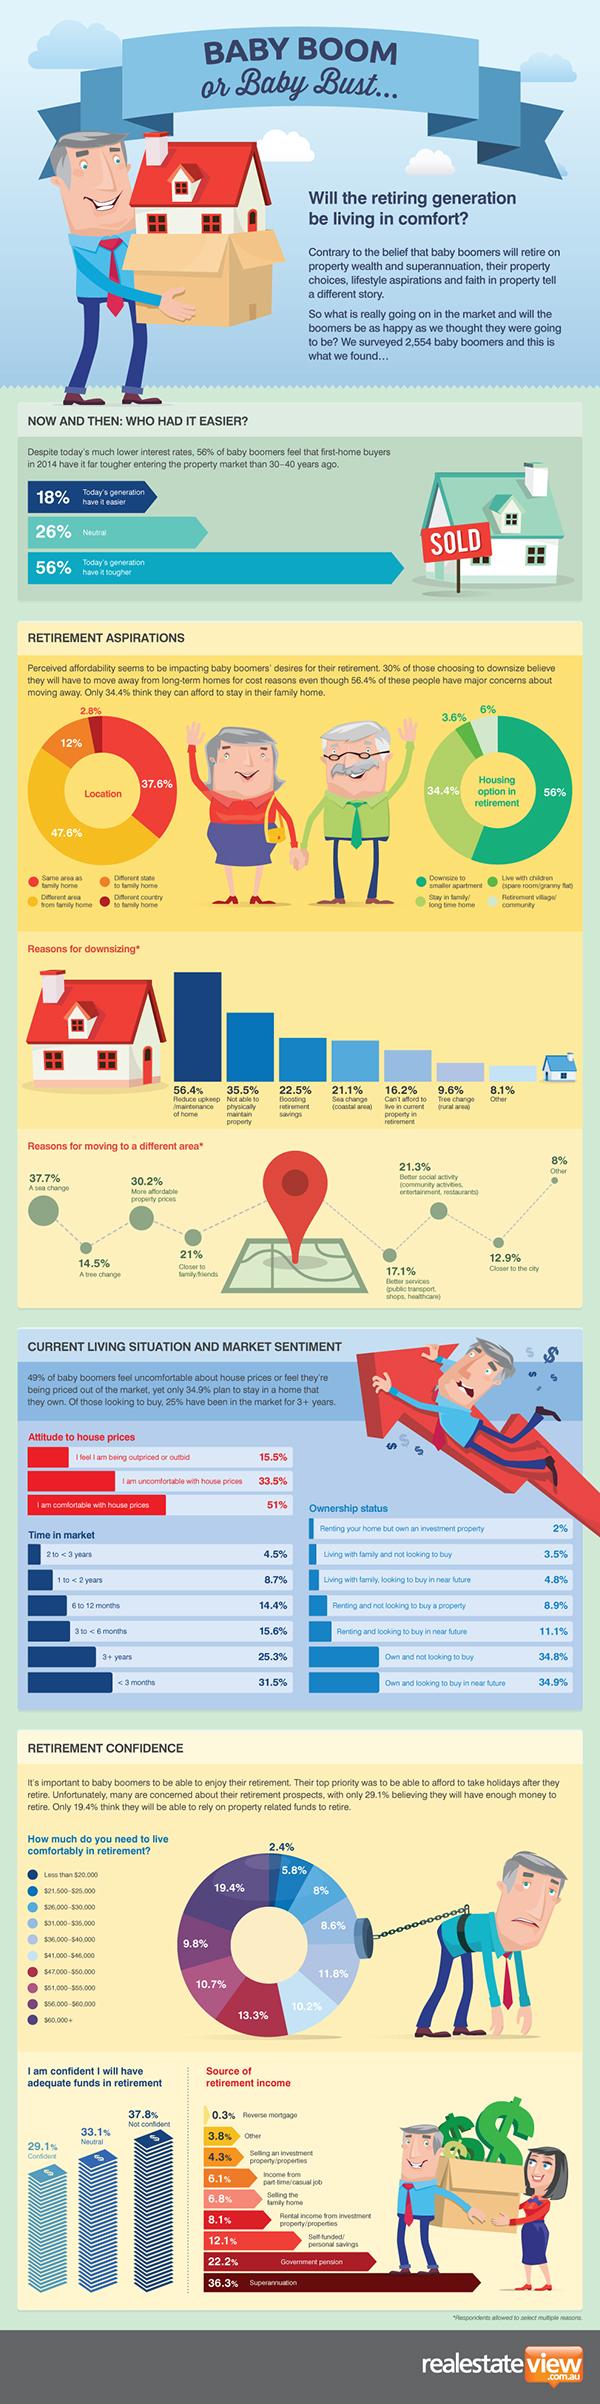 Baby Boomer Housing & Lifestyle #Infographic #infografía